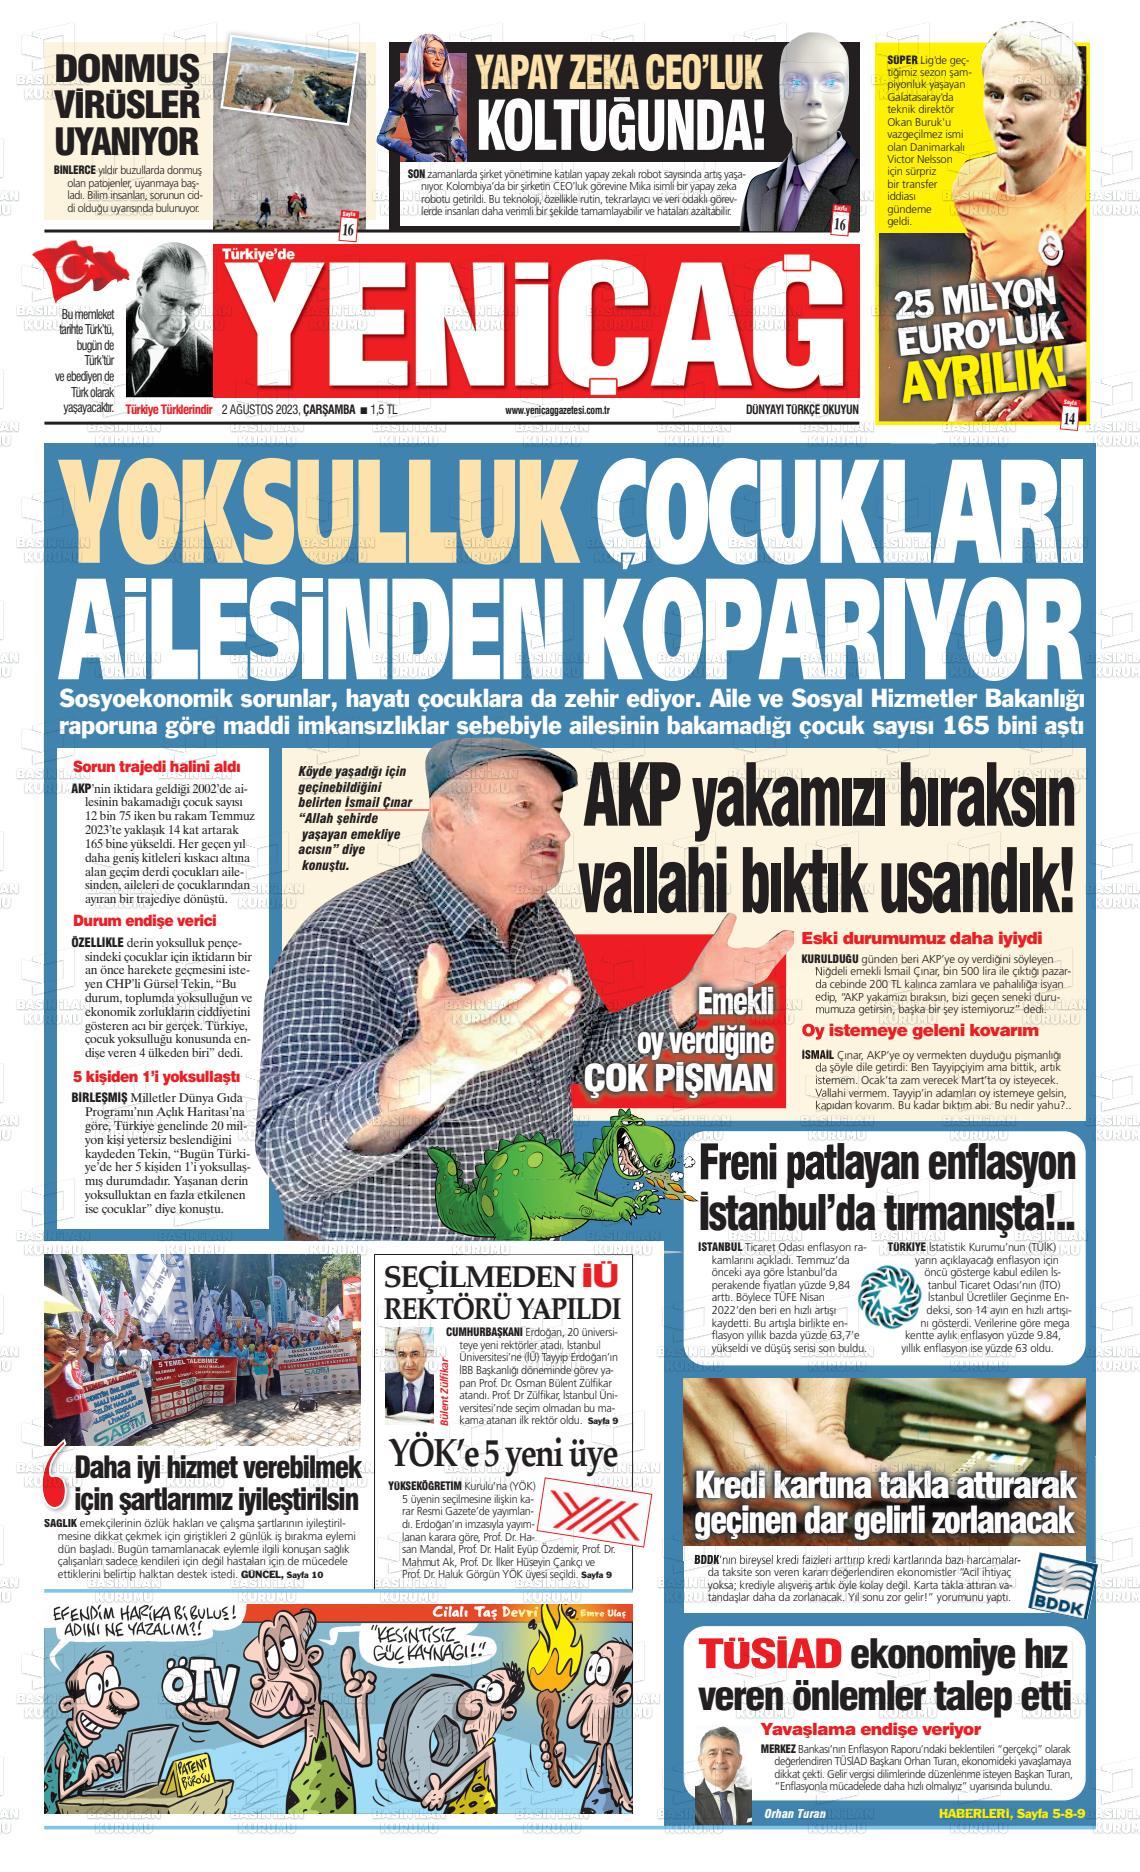 19 Eylül 2019, Perşembe yenicag Gazetesi